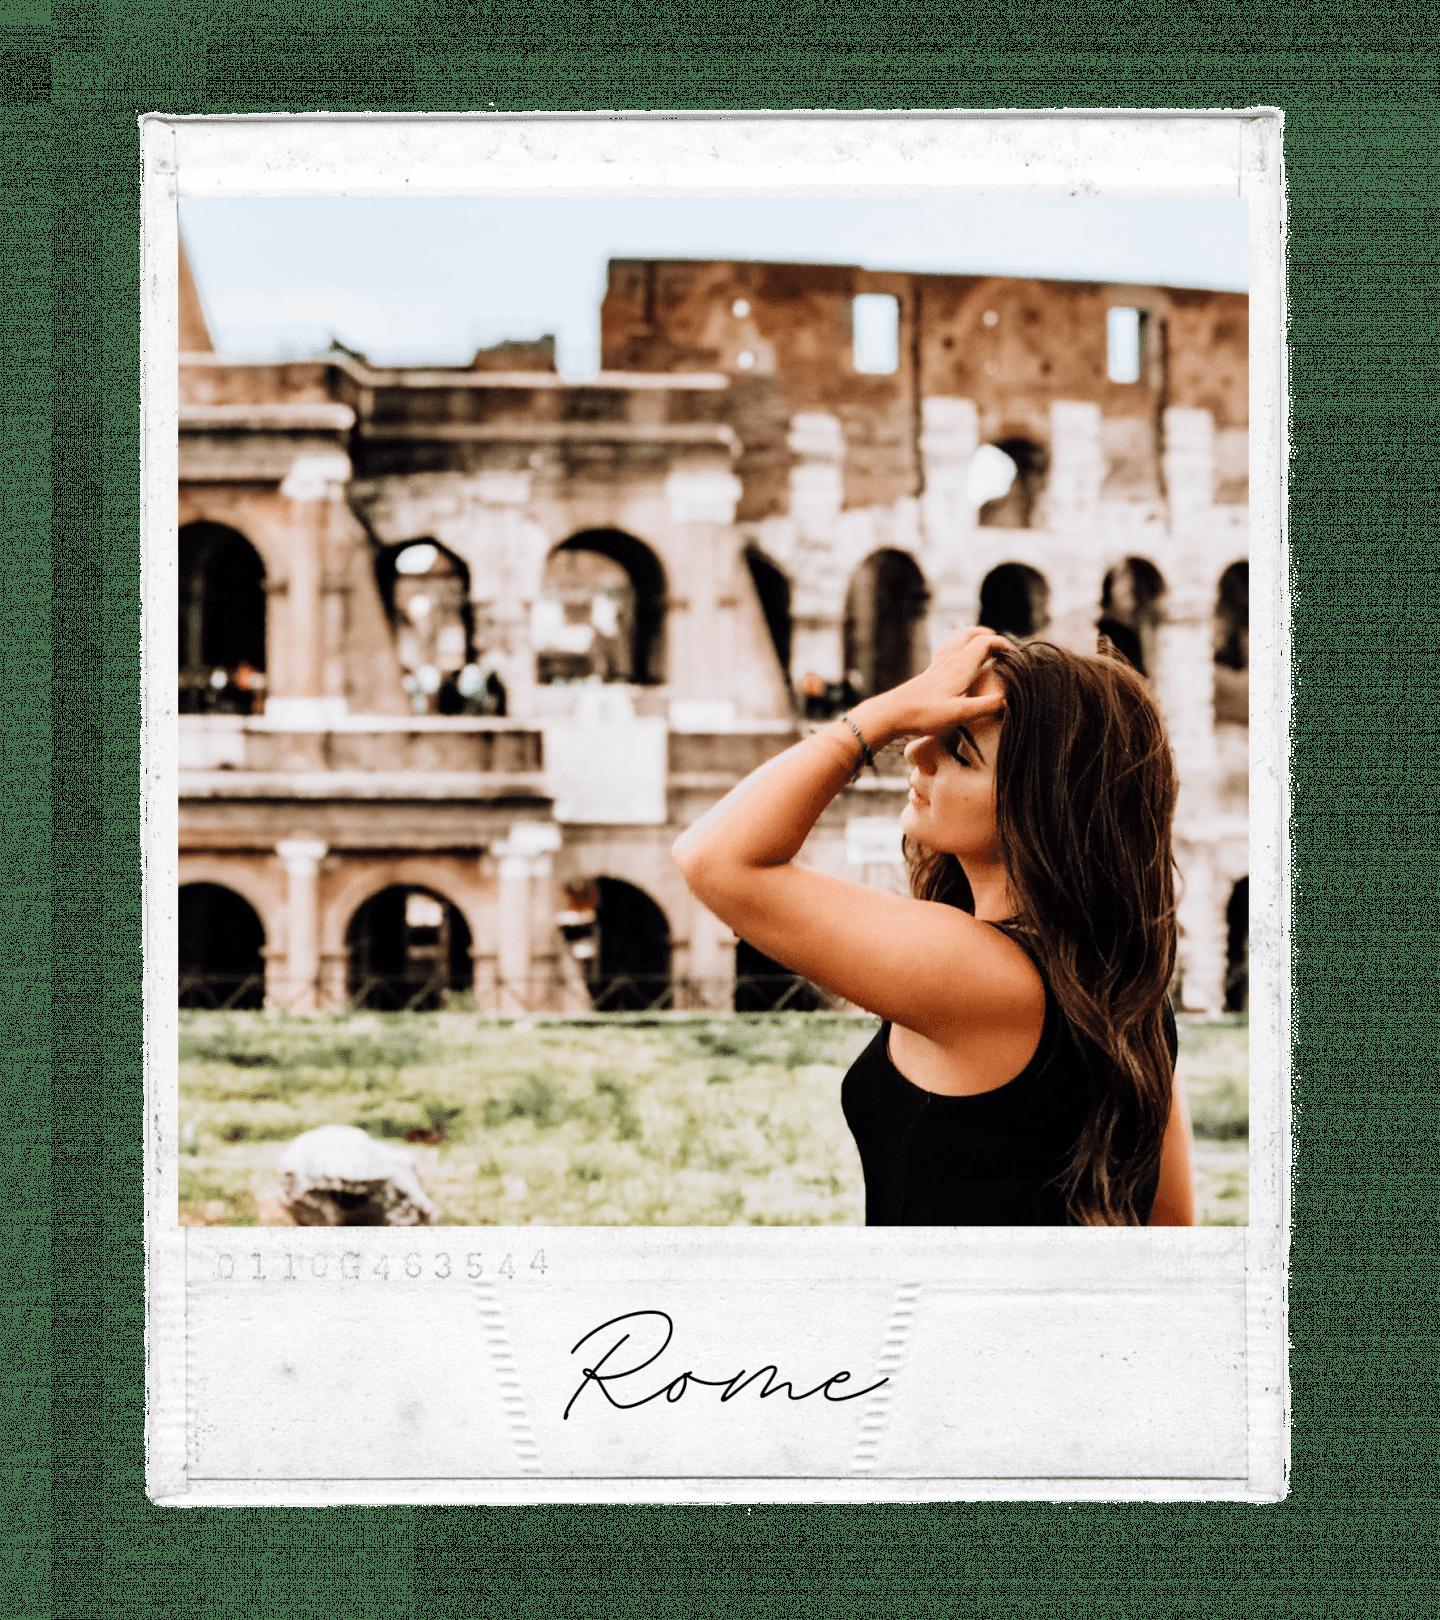 The Best Restaurants in Trastevere (and Other Neighborhoods in Rome)